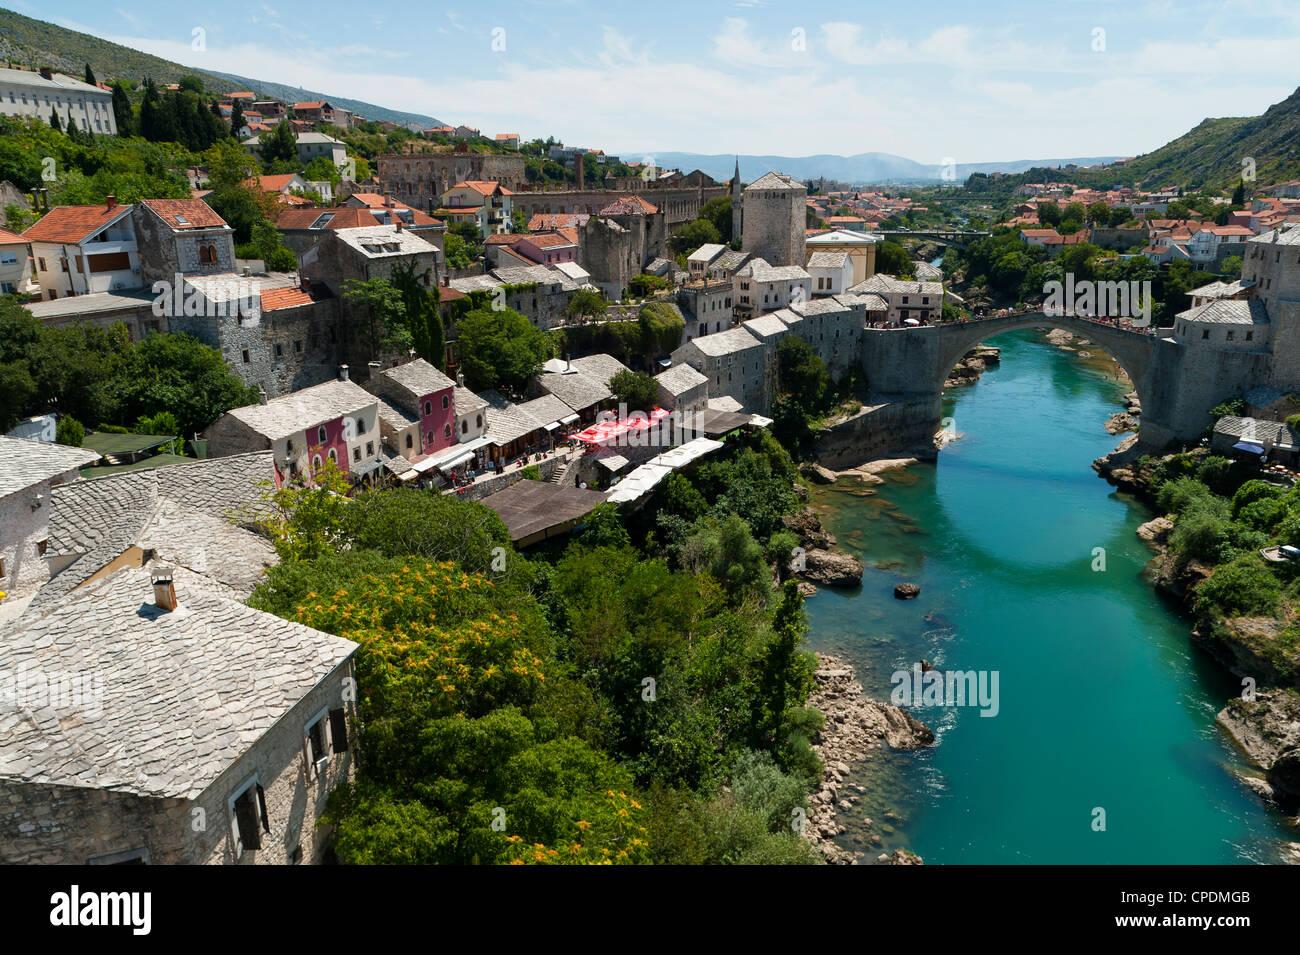 Mostar, UNESCO World Heritage Site, municipality of Mostar, Bosnia and Herzegovina, Europe - Stock Image